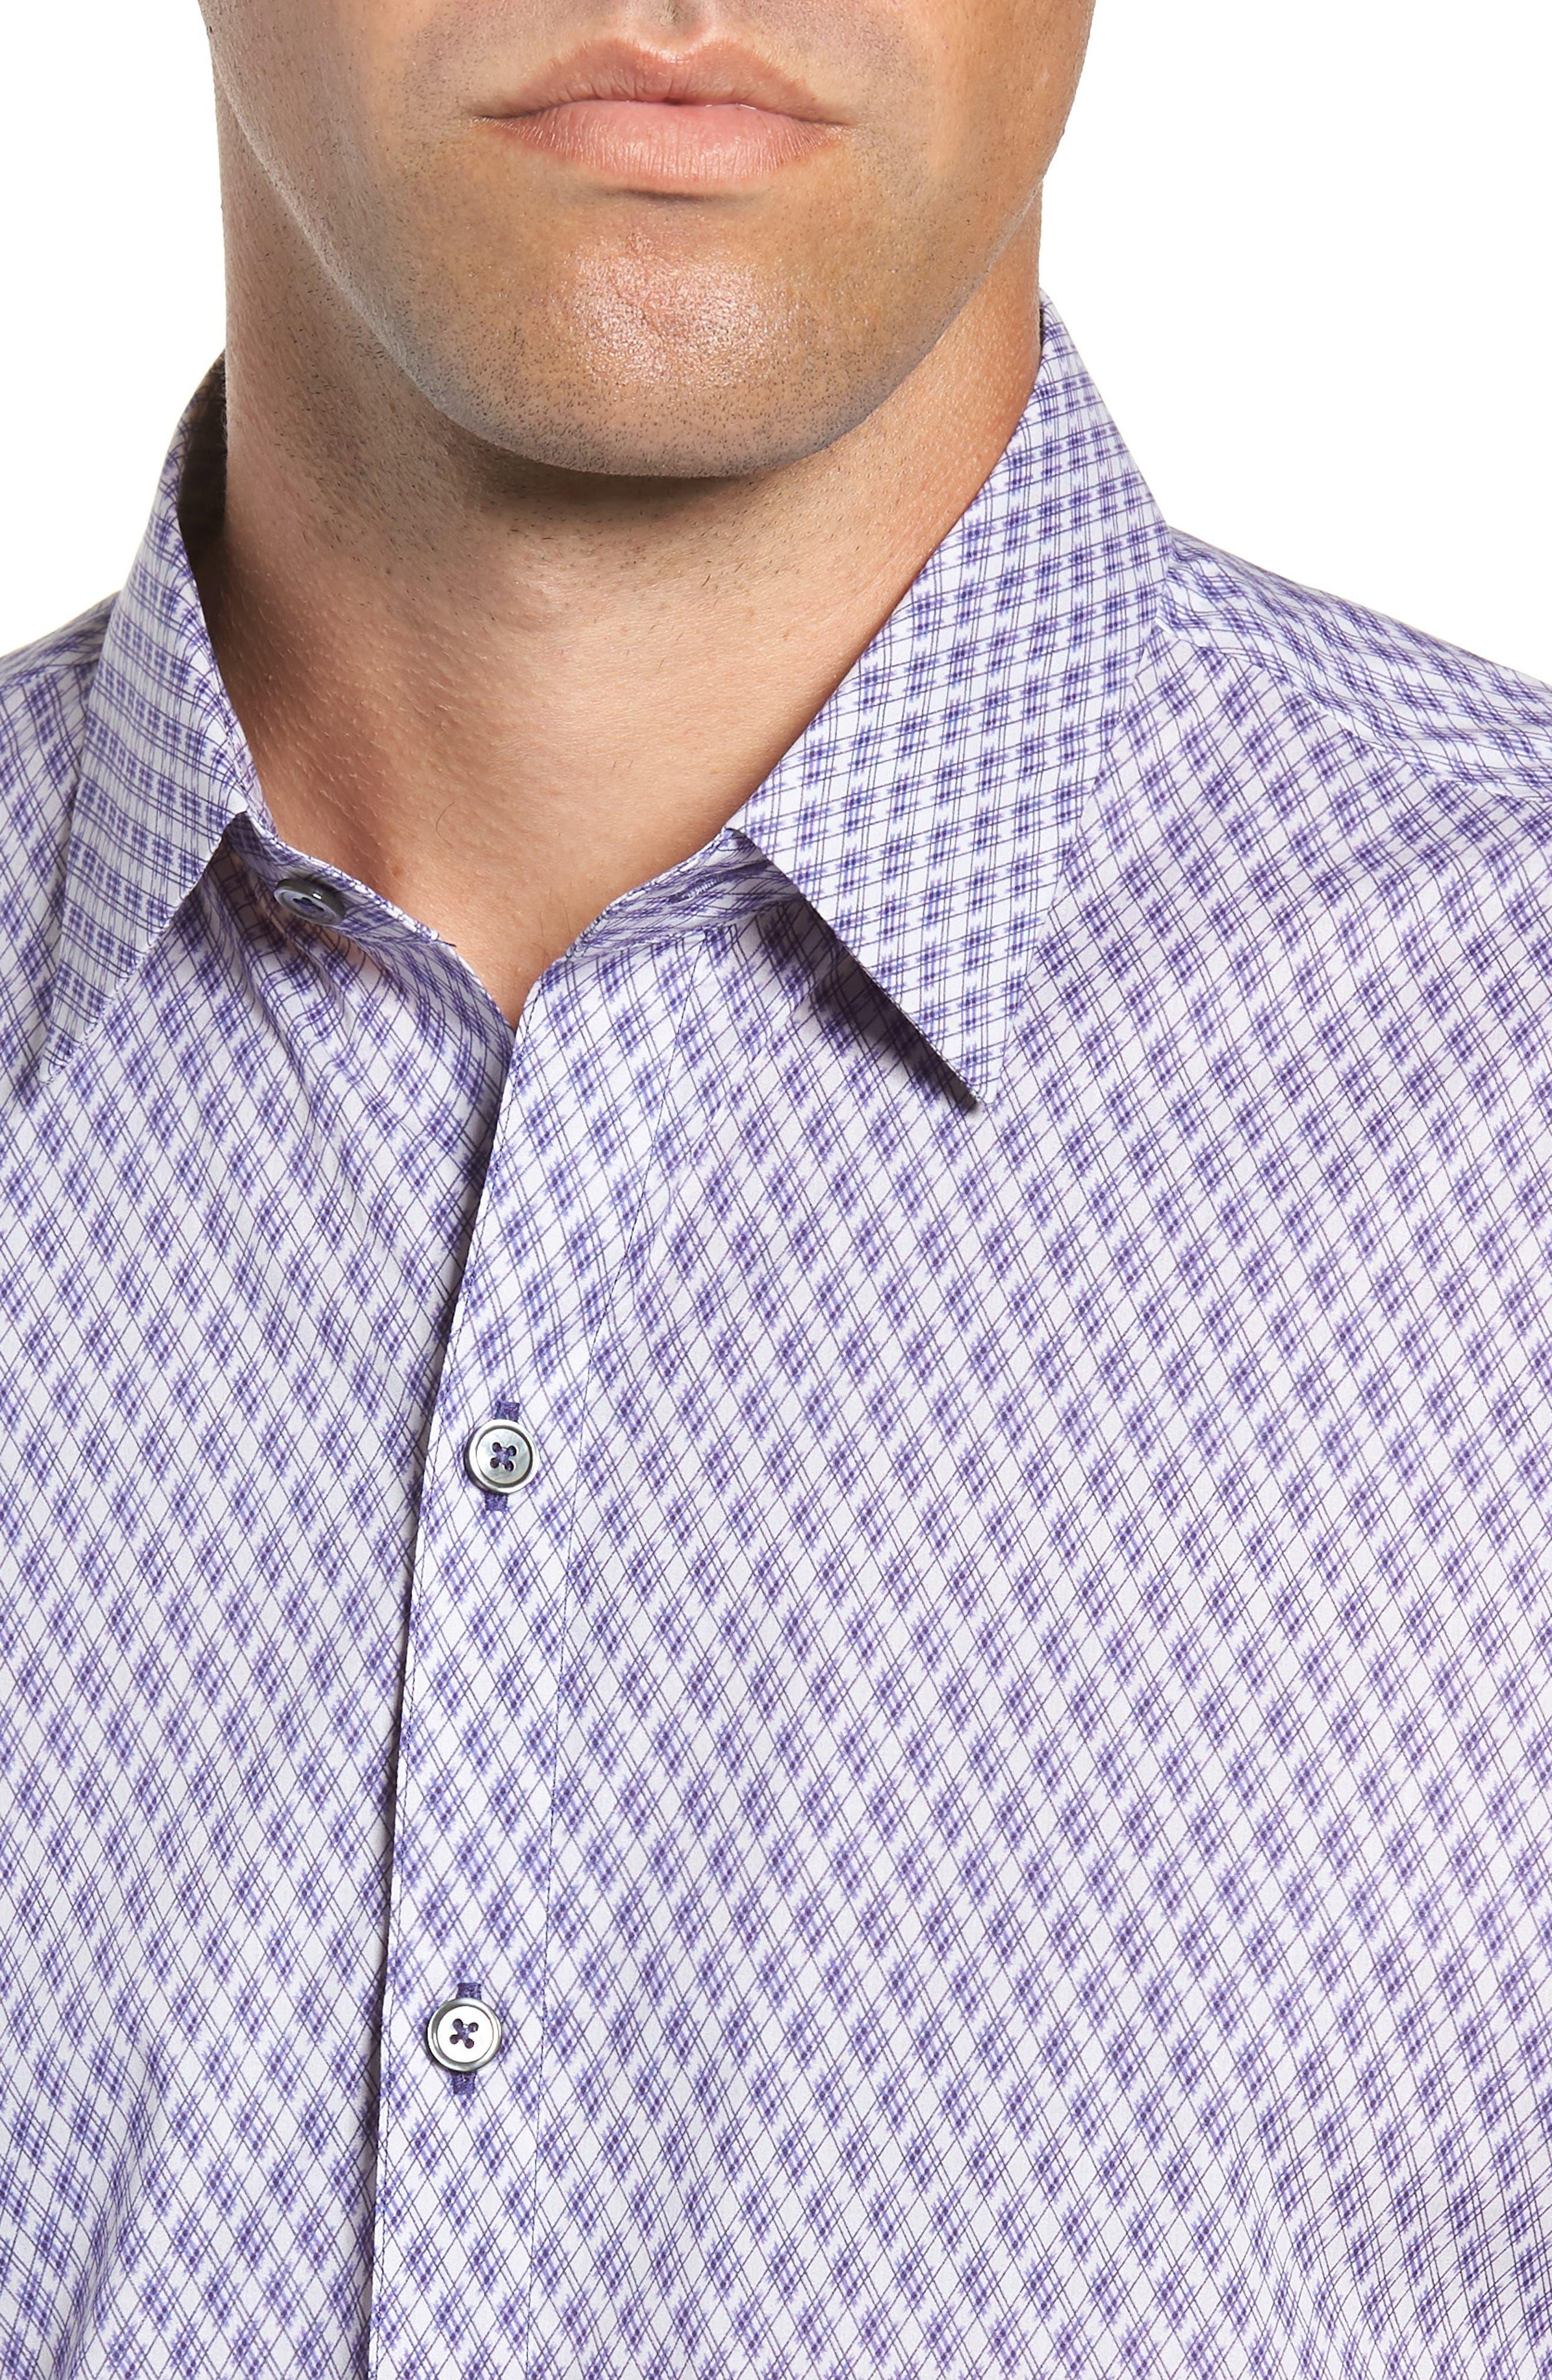 Madorin Regular Fit Sport Shirt,                             Alternate thumbnail 2, color,                             PURPLE